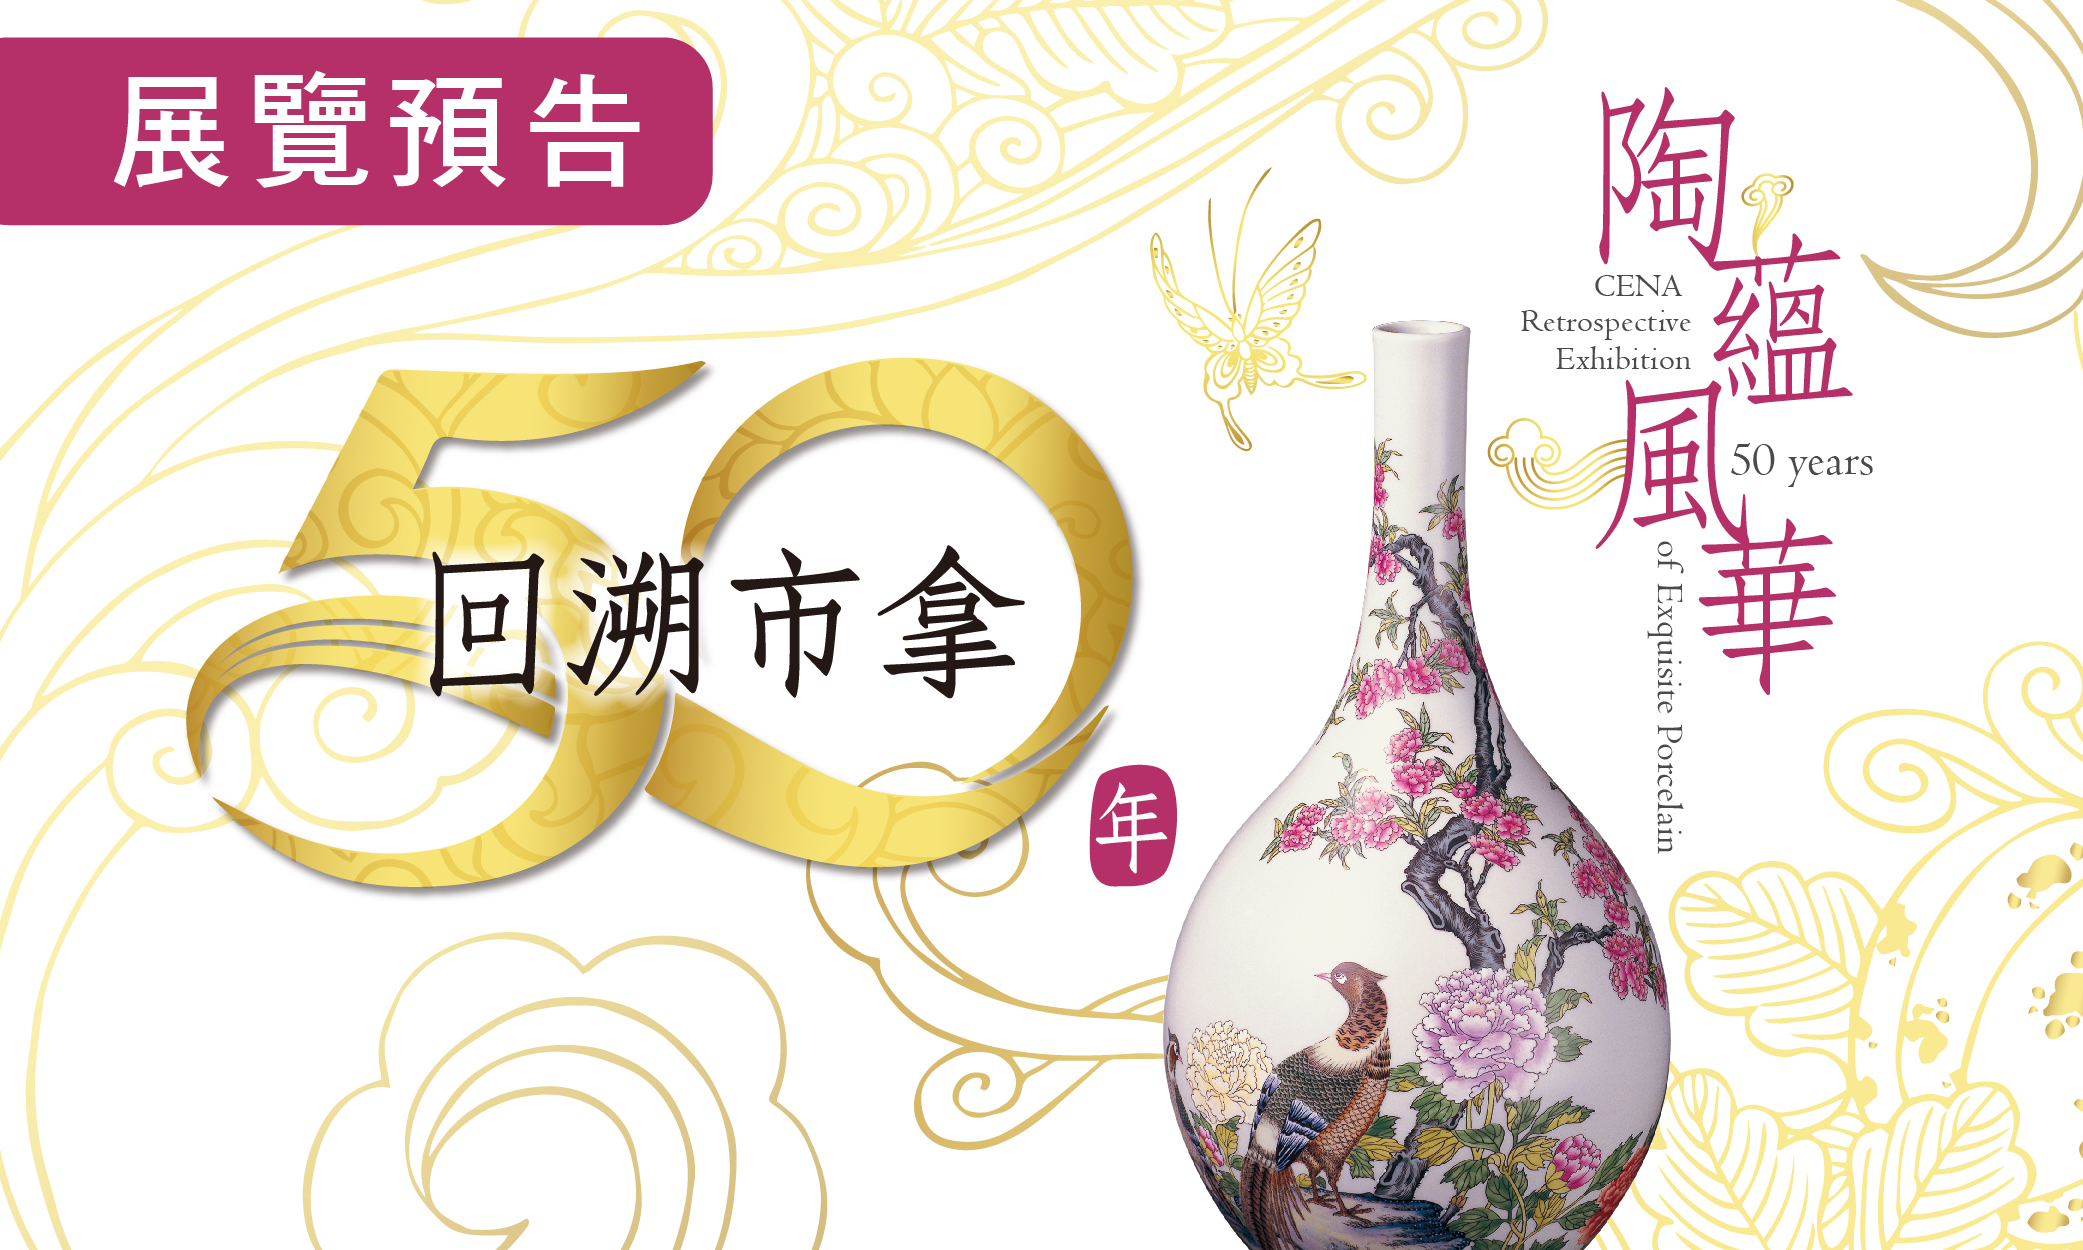 Cena Retrospective Exhibition : 50 years of Exquisite Porcelain